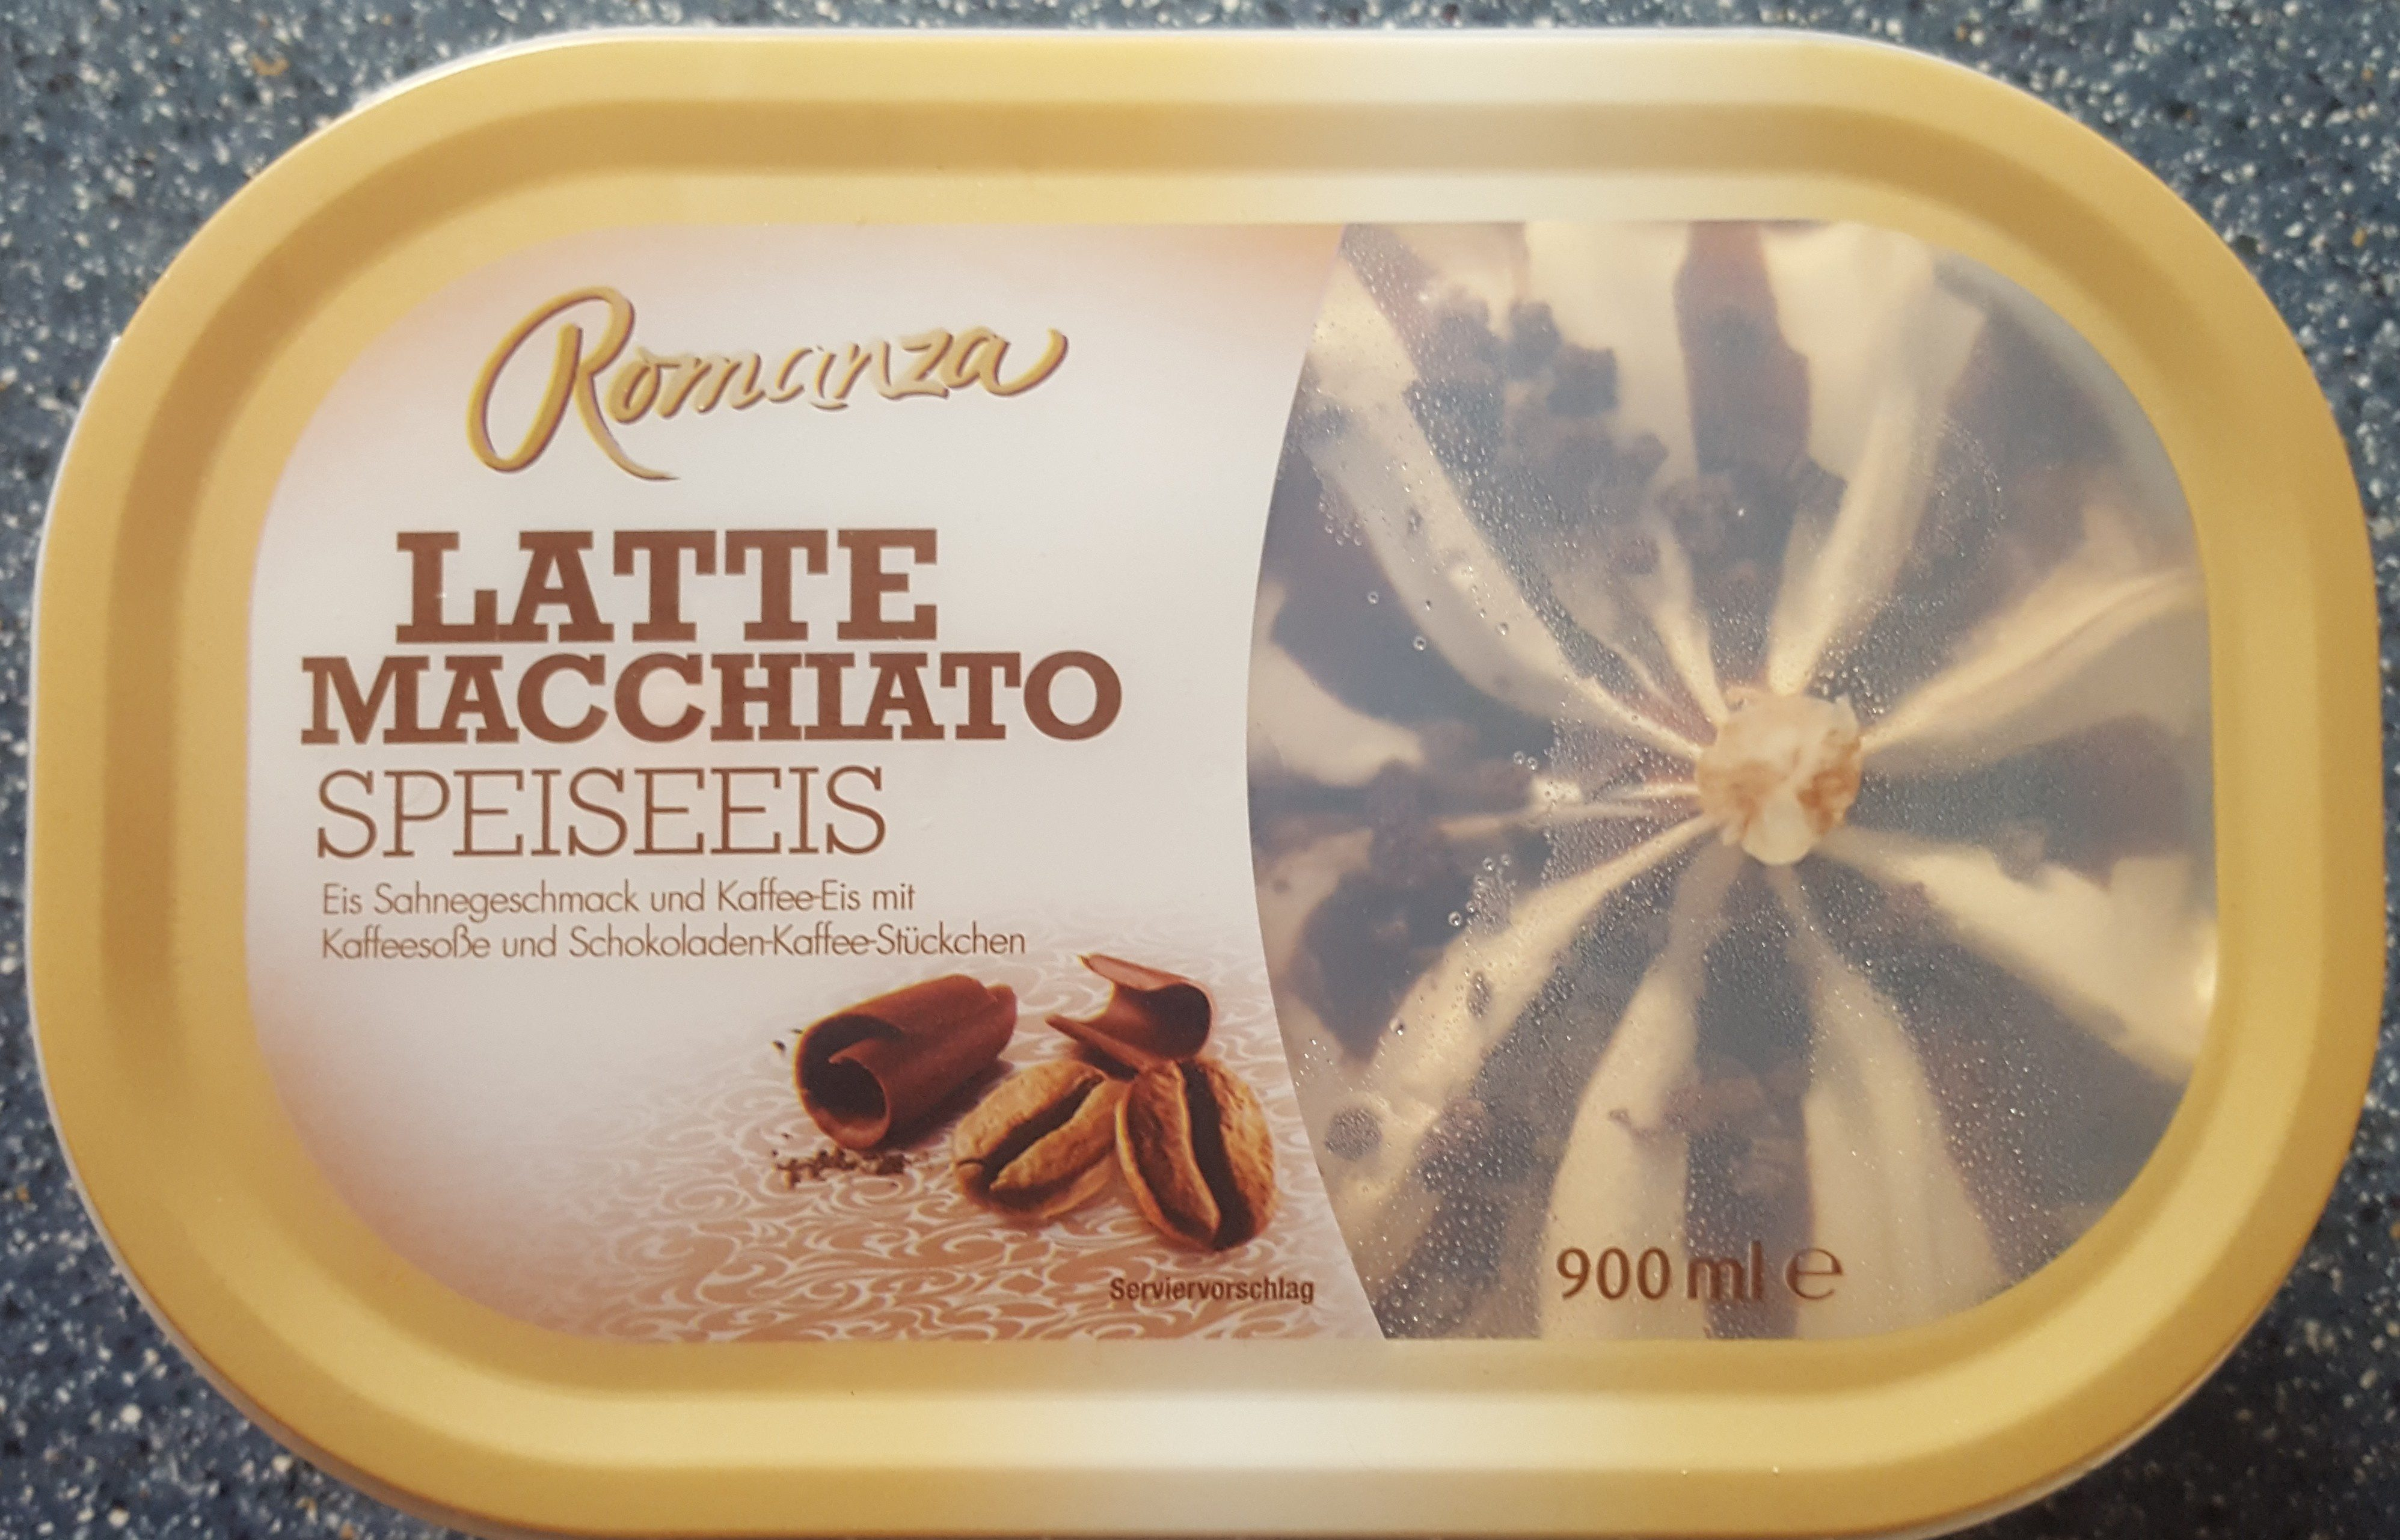 Latte Macchiato Speiseeis - Product